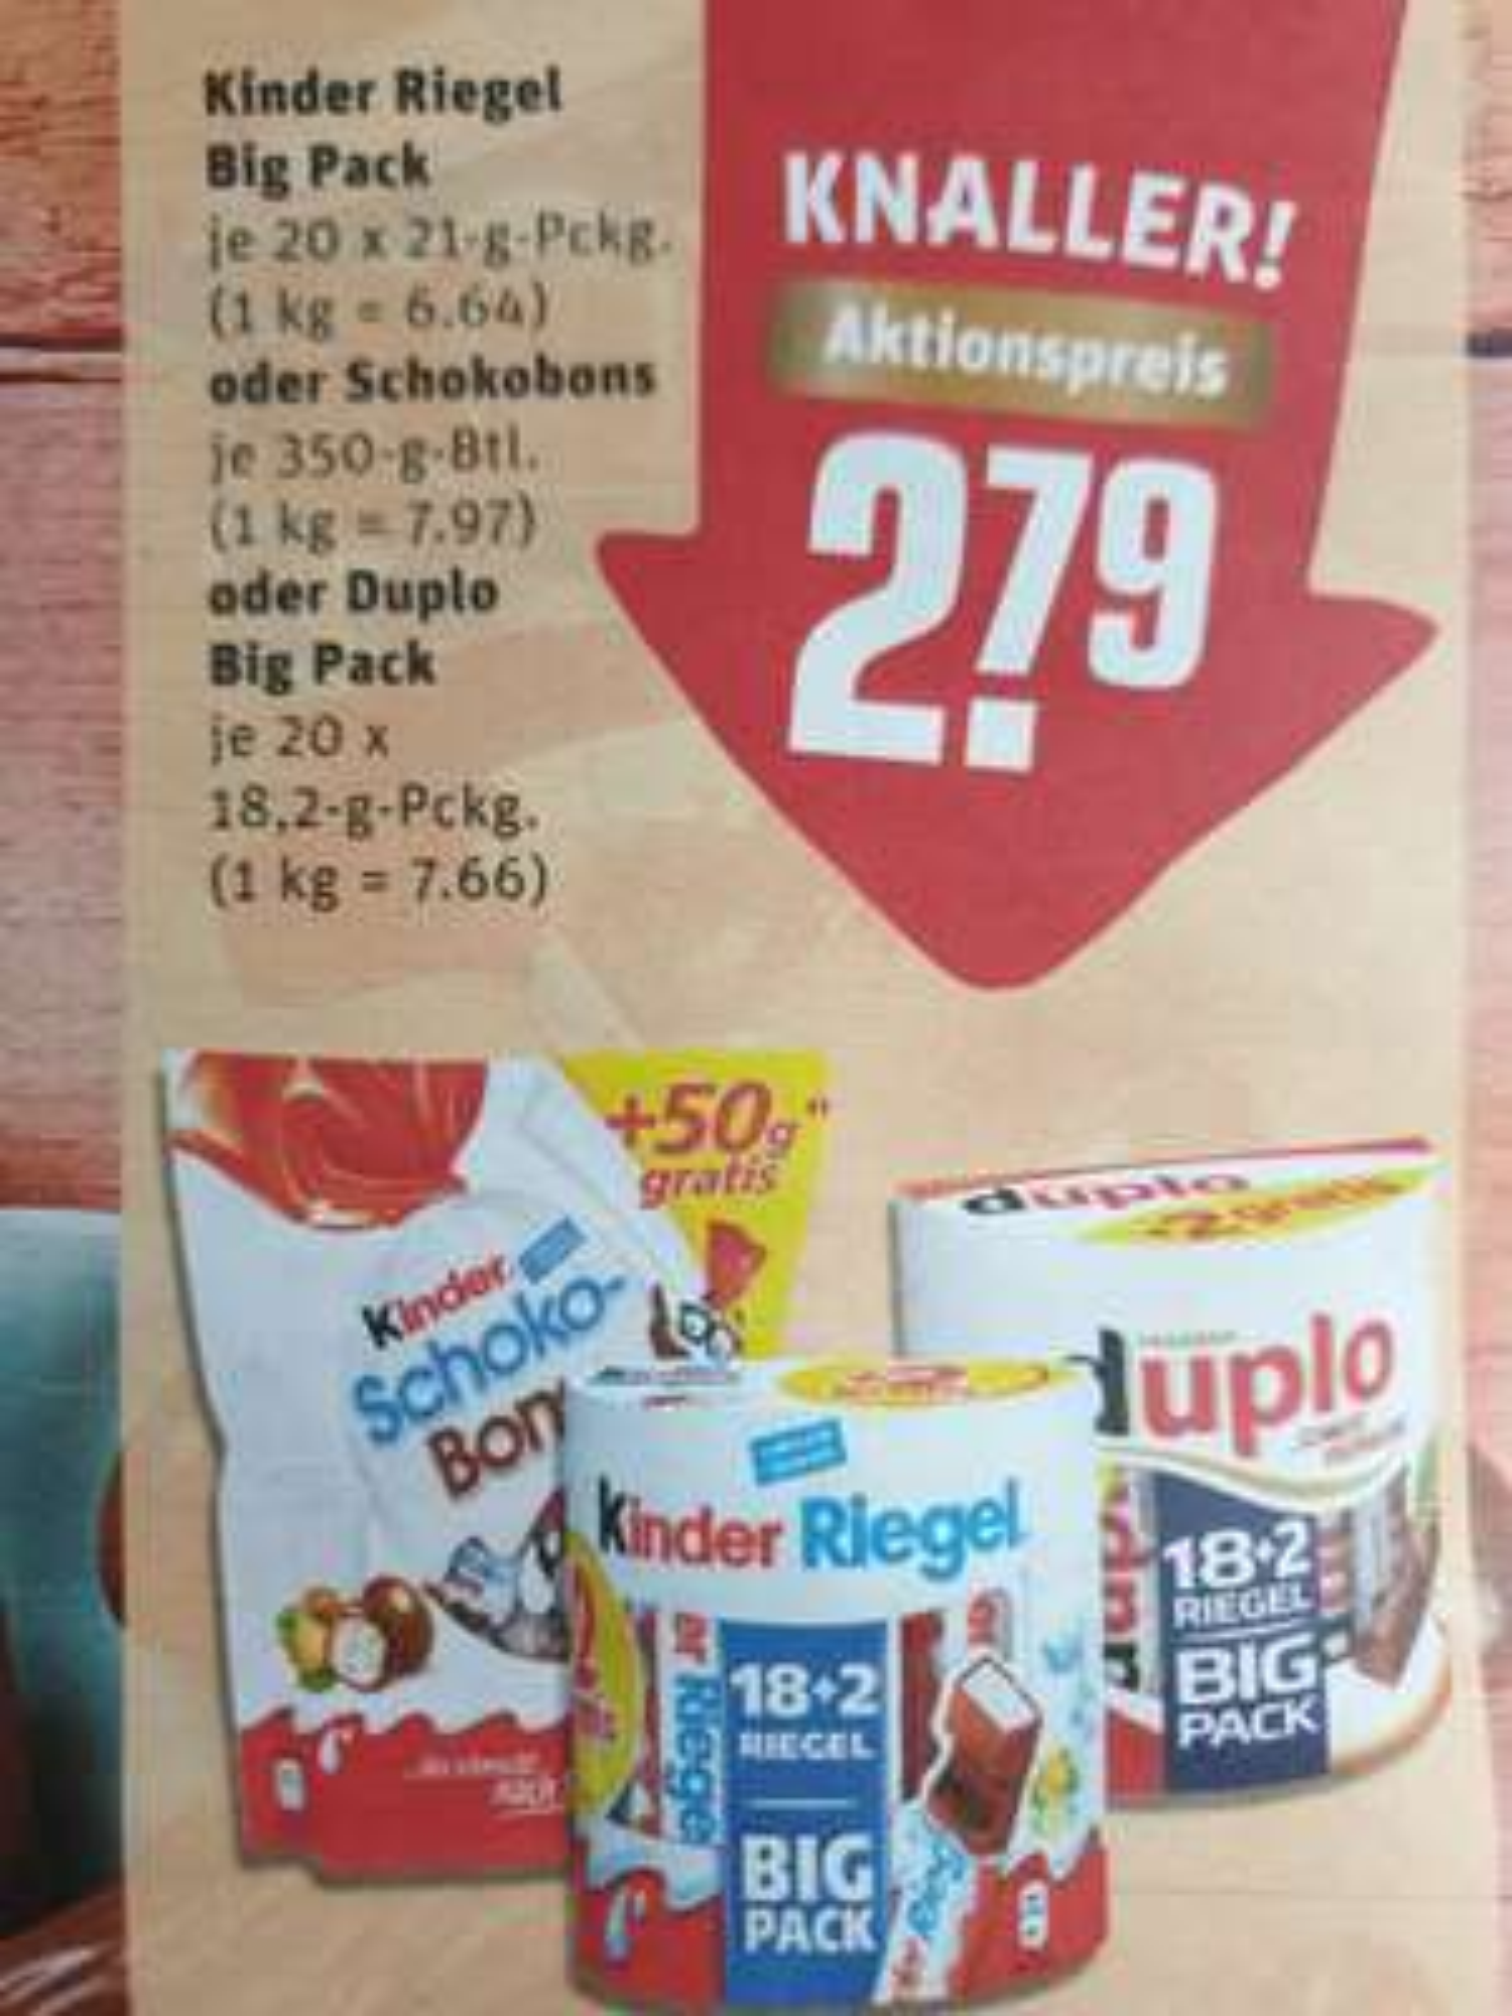 (Rewe,evtl. regional) Kinder-Riegel/Duplo 18+2 gratis / Schokobons + 50g gratis Big Pack Weihnachtsteller!